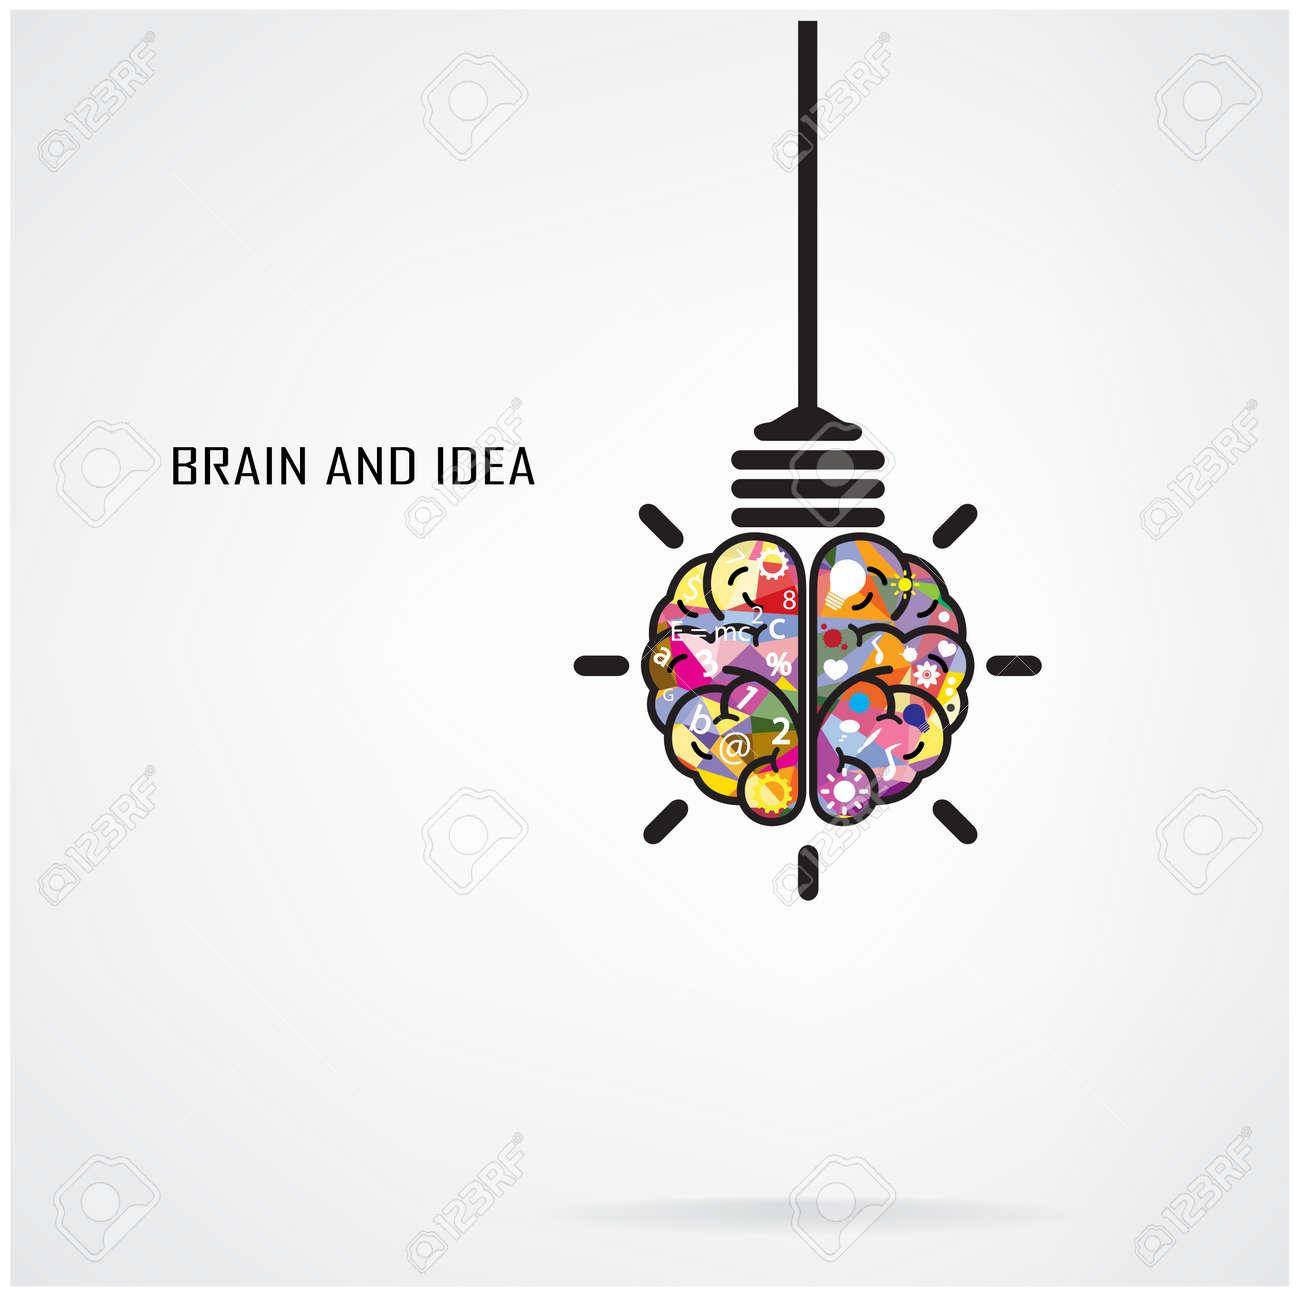 creative brain idea and light bulb concept design for poster